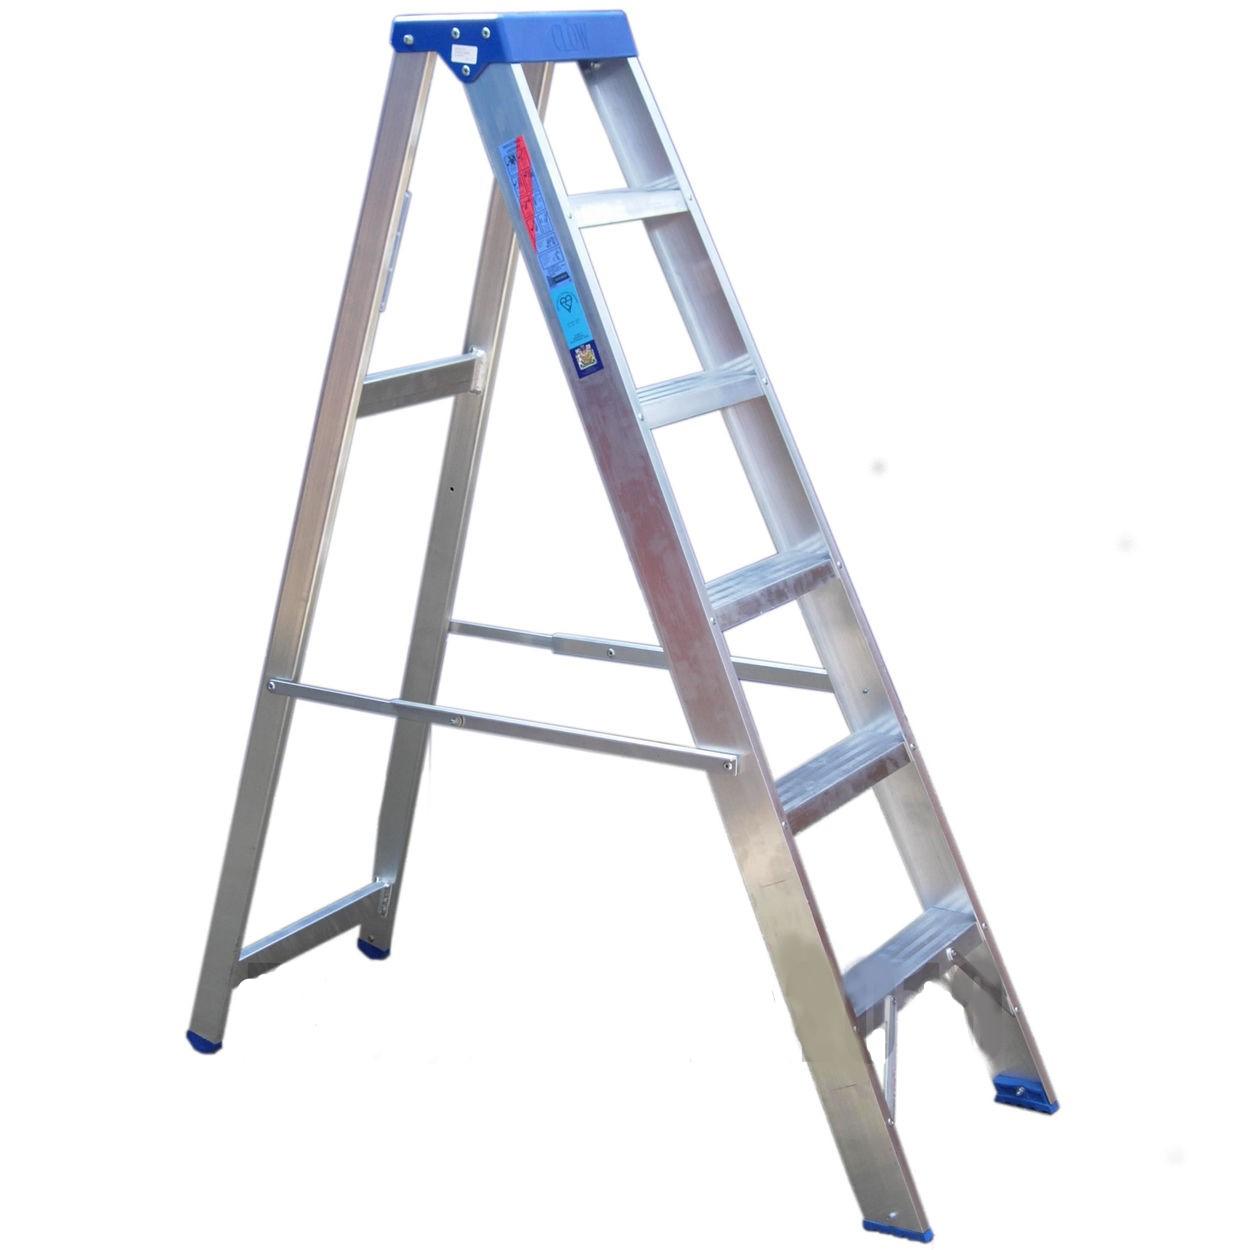 006335 Aluminium platform step